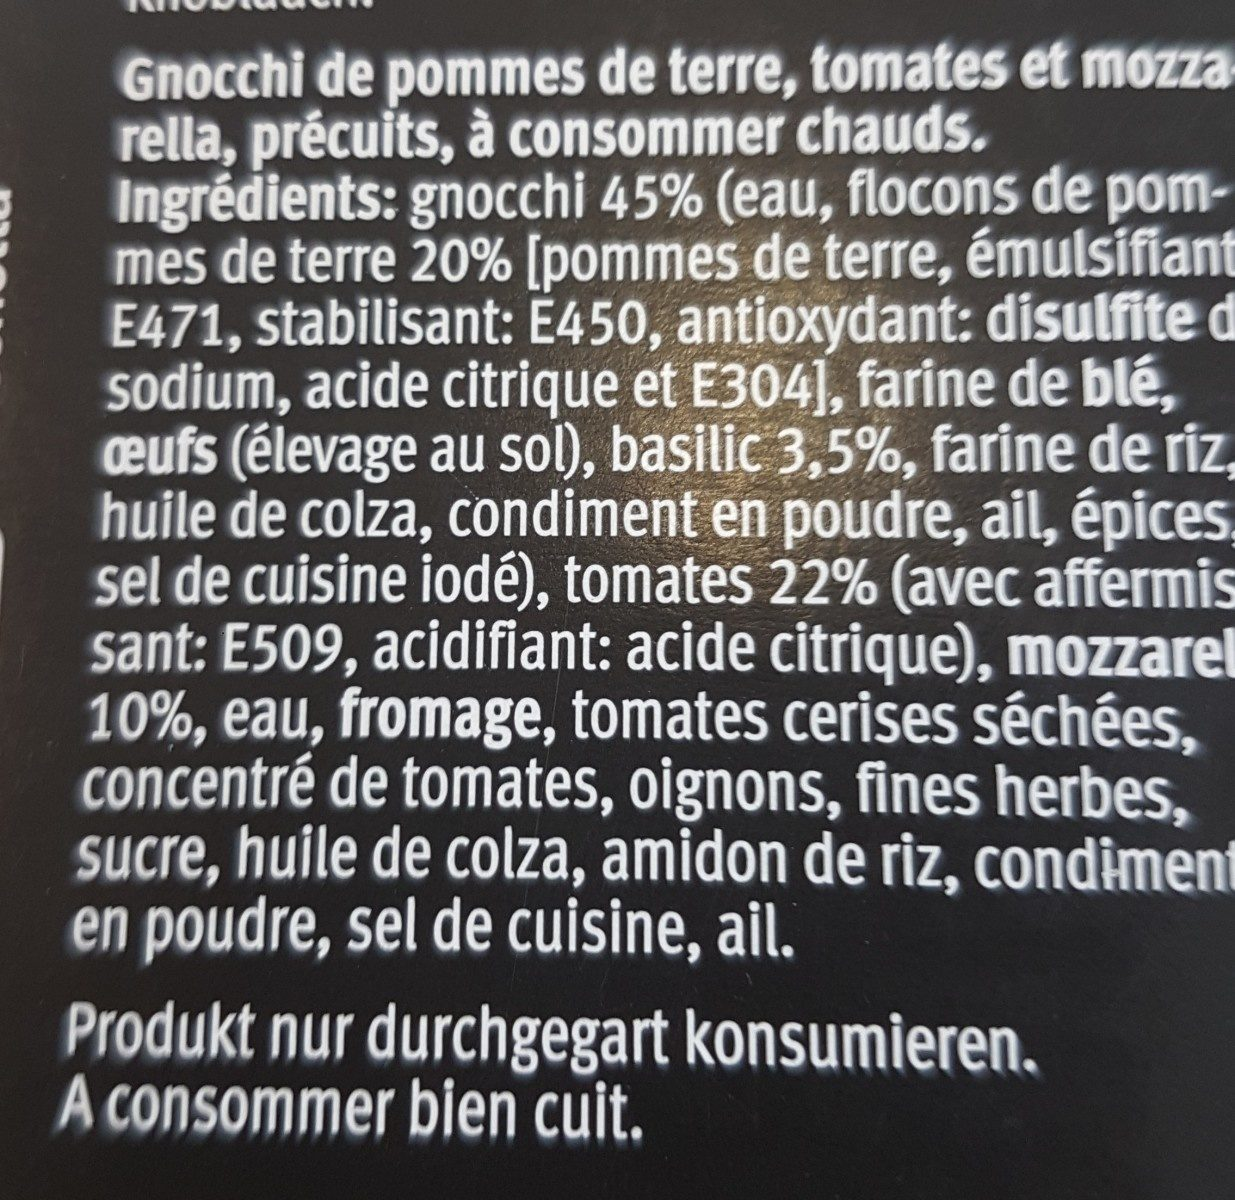 Gnocchi alors basilic con pomodorini e mozzarella - Ingrédients - fr